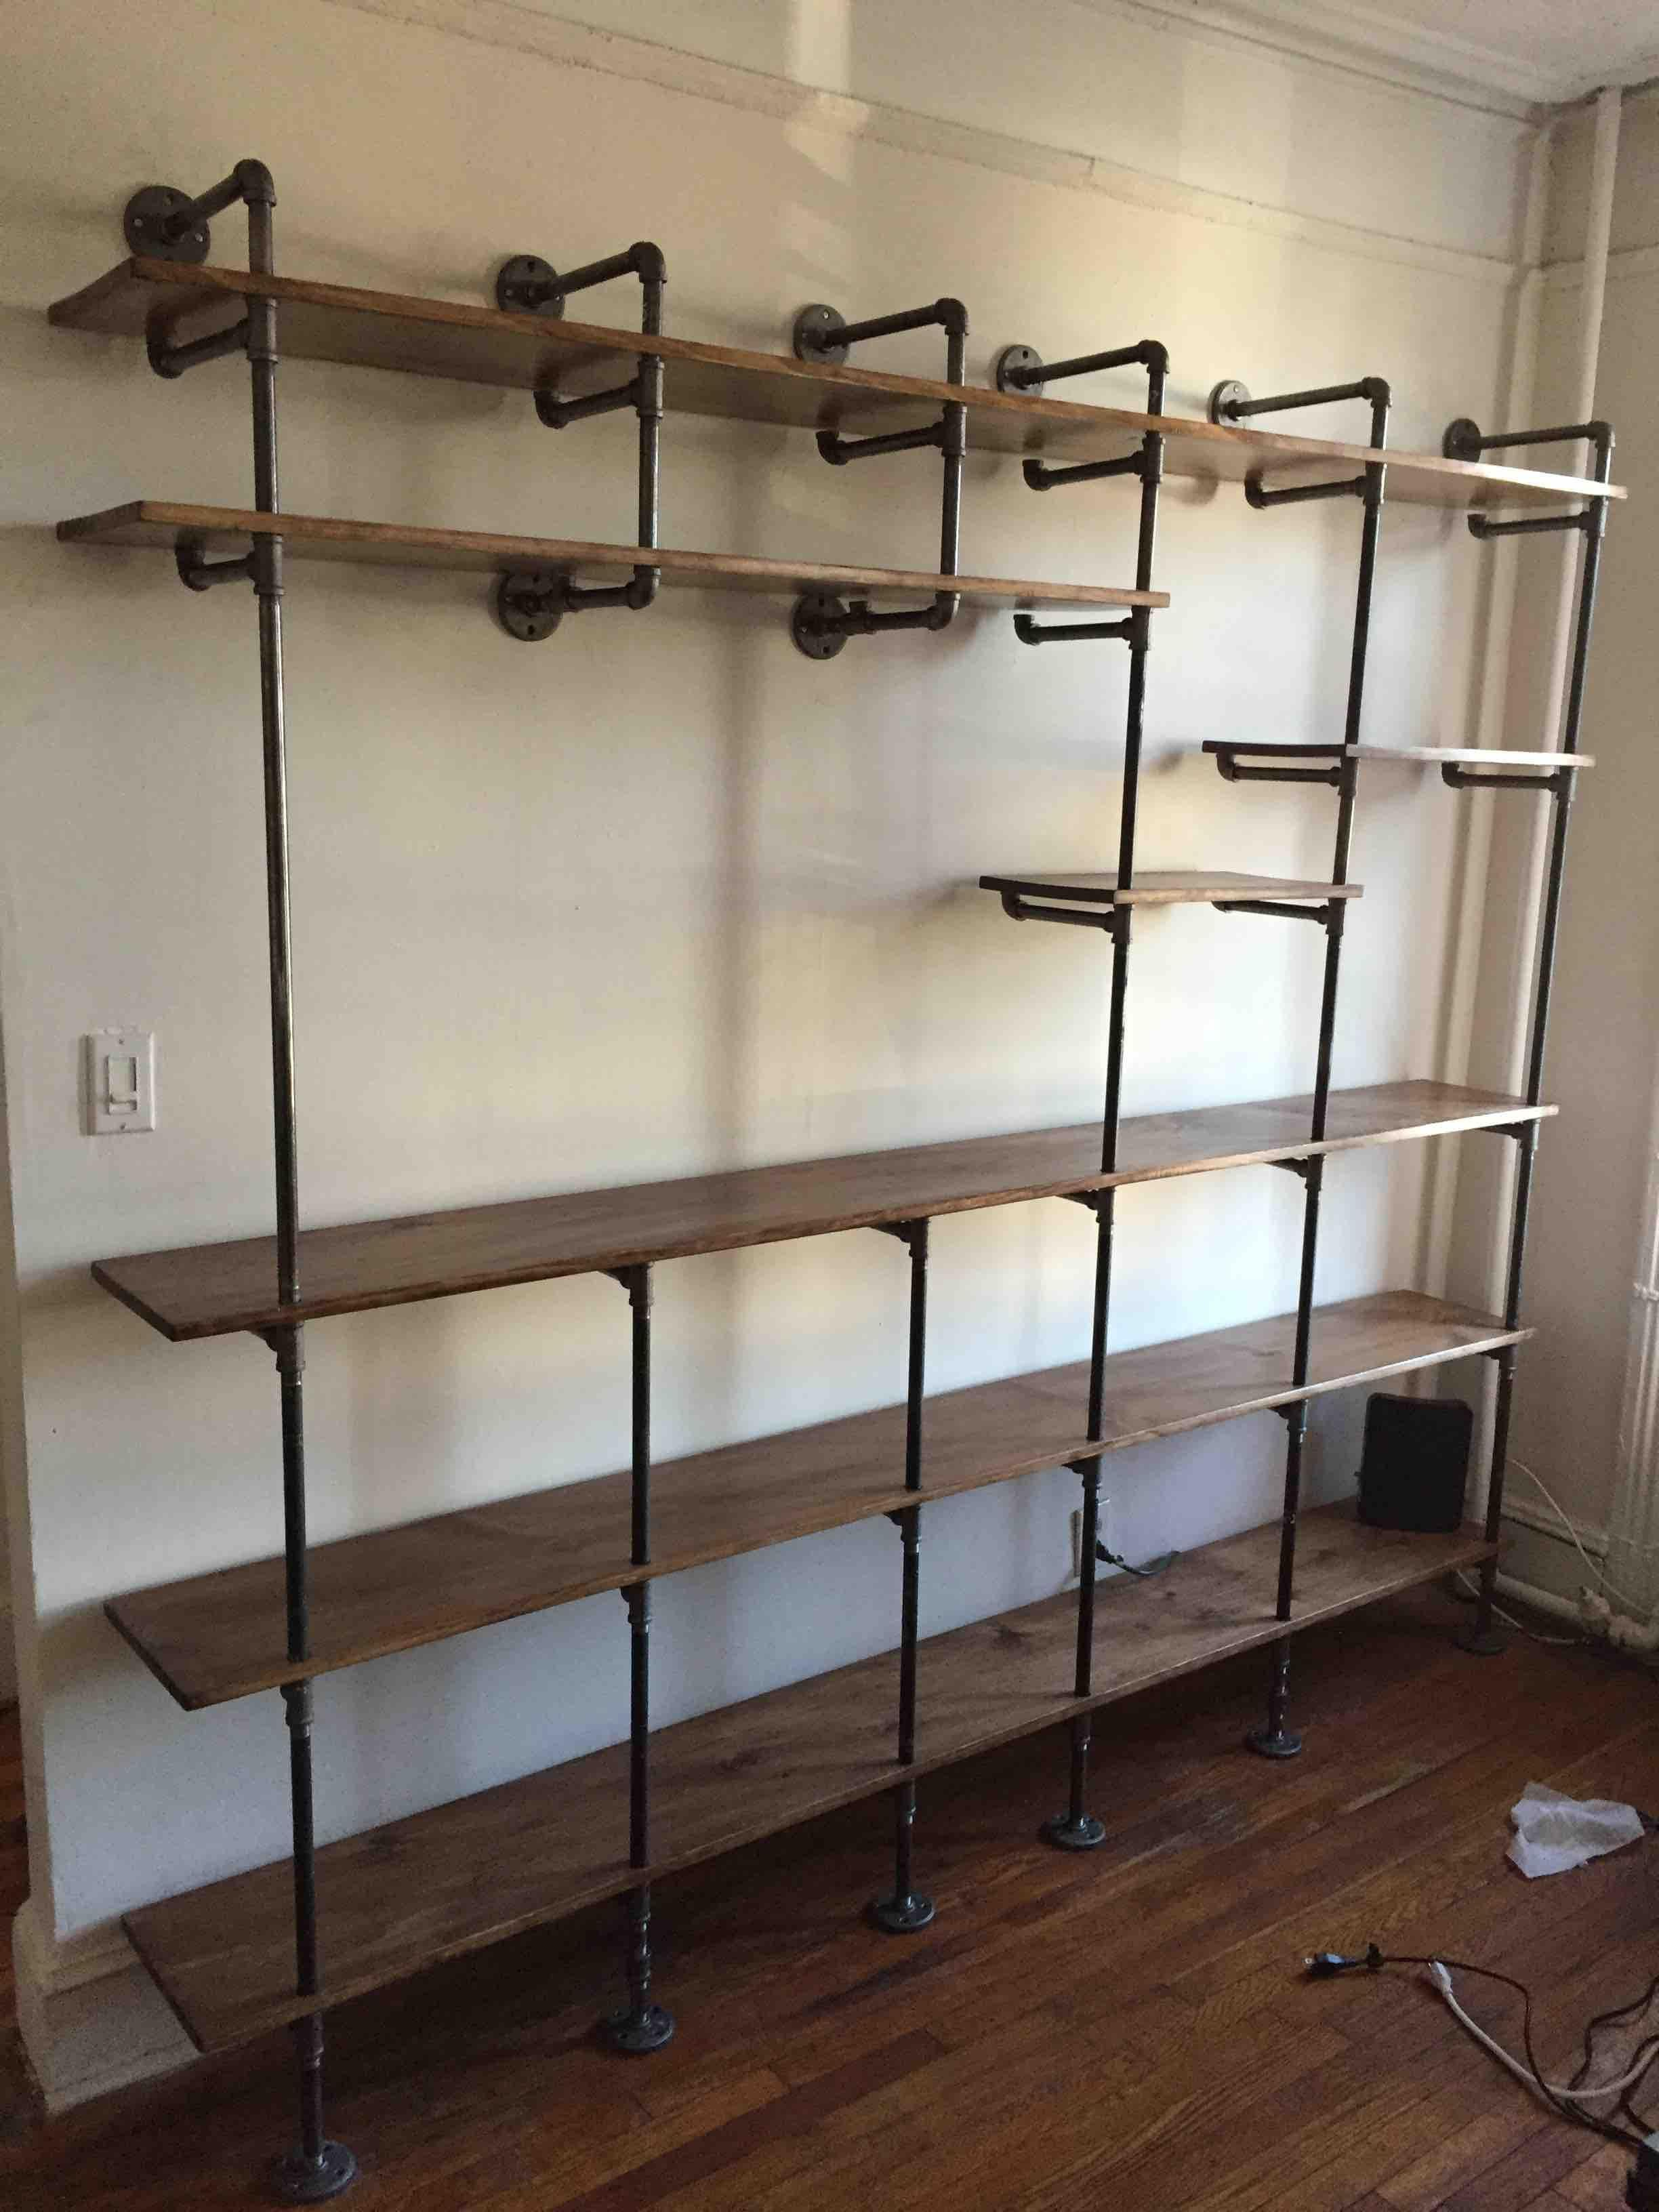 Plumbing Pipe Shelves | Larp Workshop | Pinterest ...